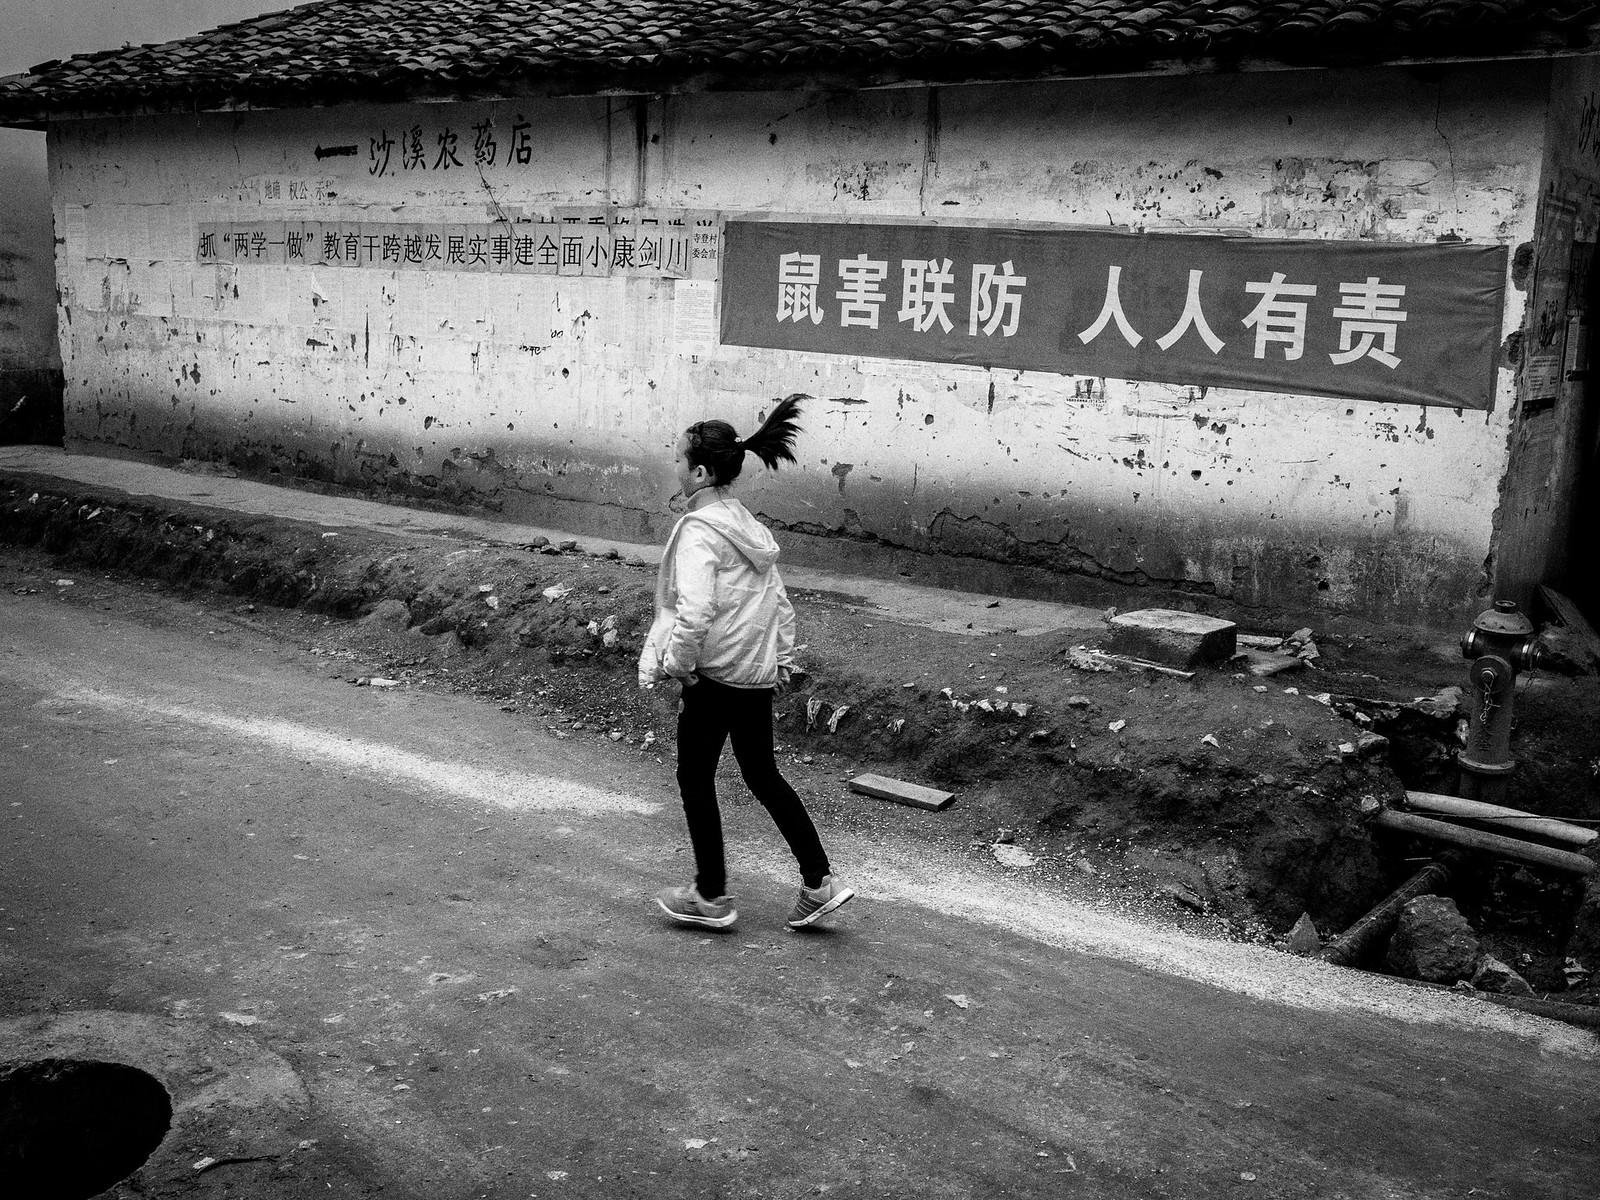 girl running from slogans | by tzen xing